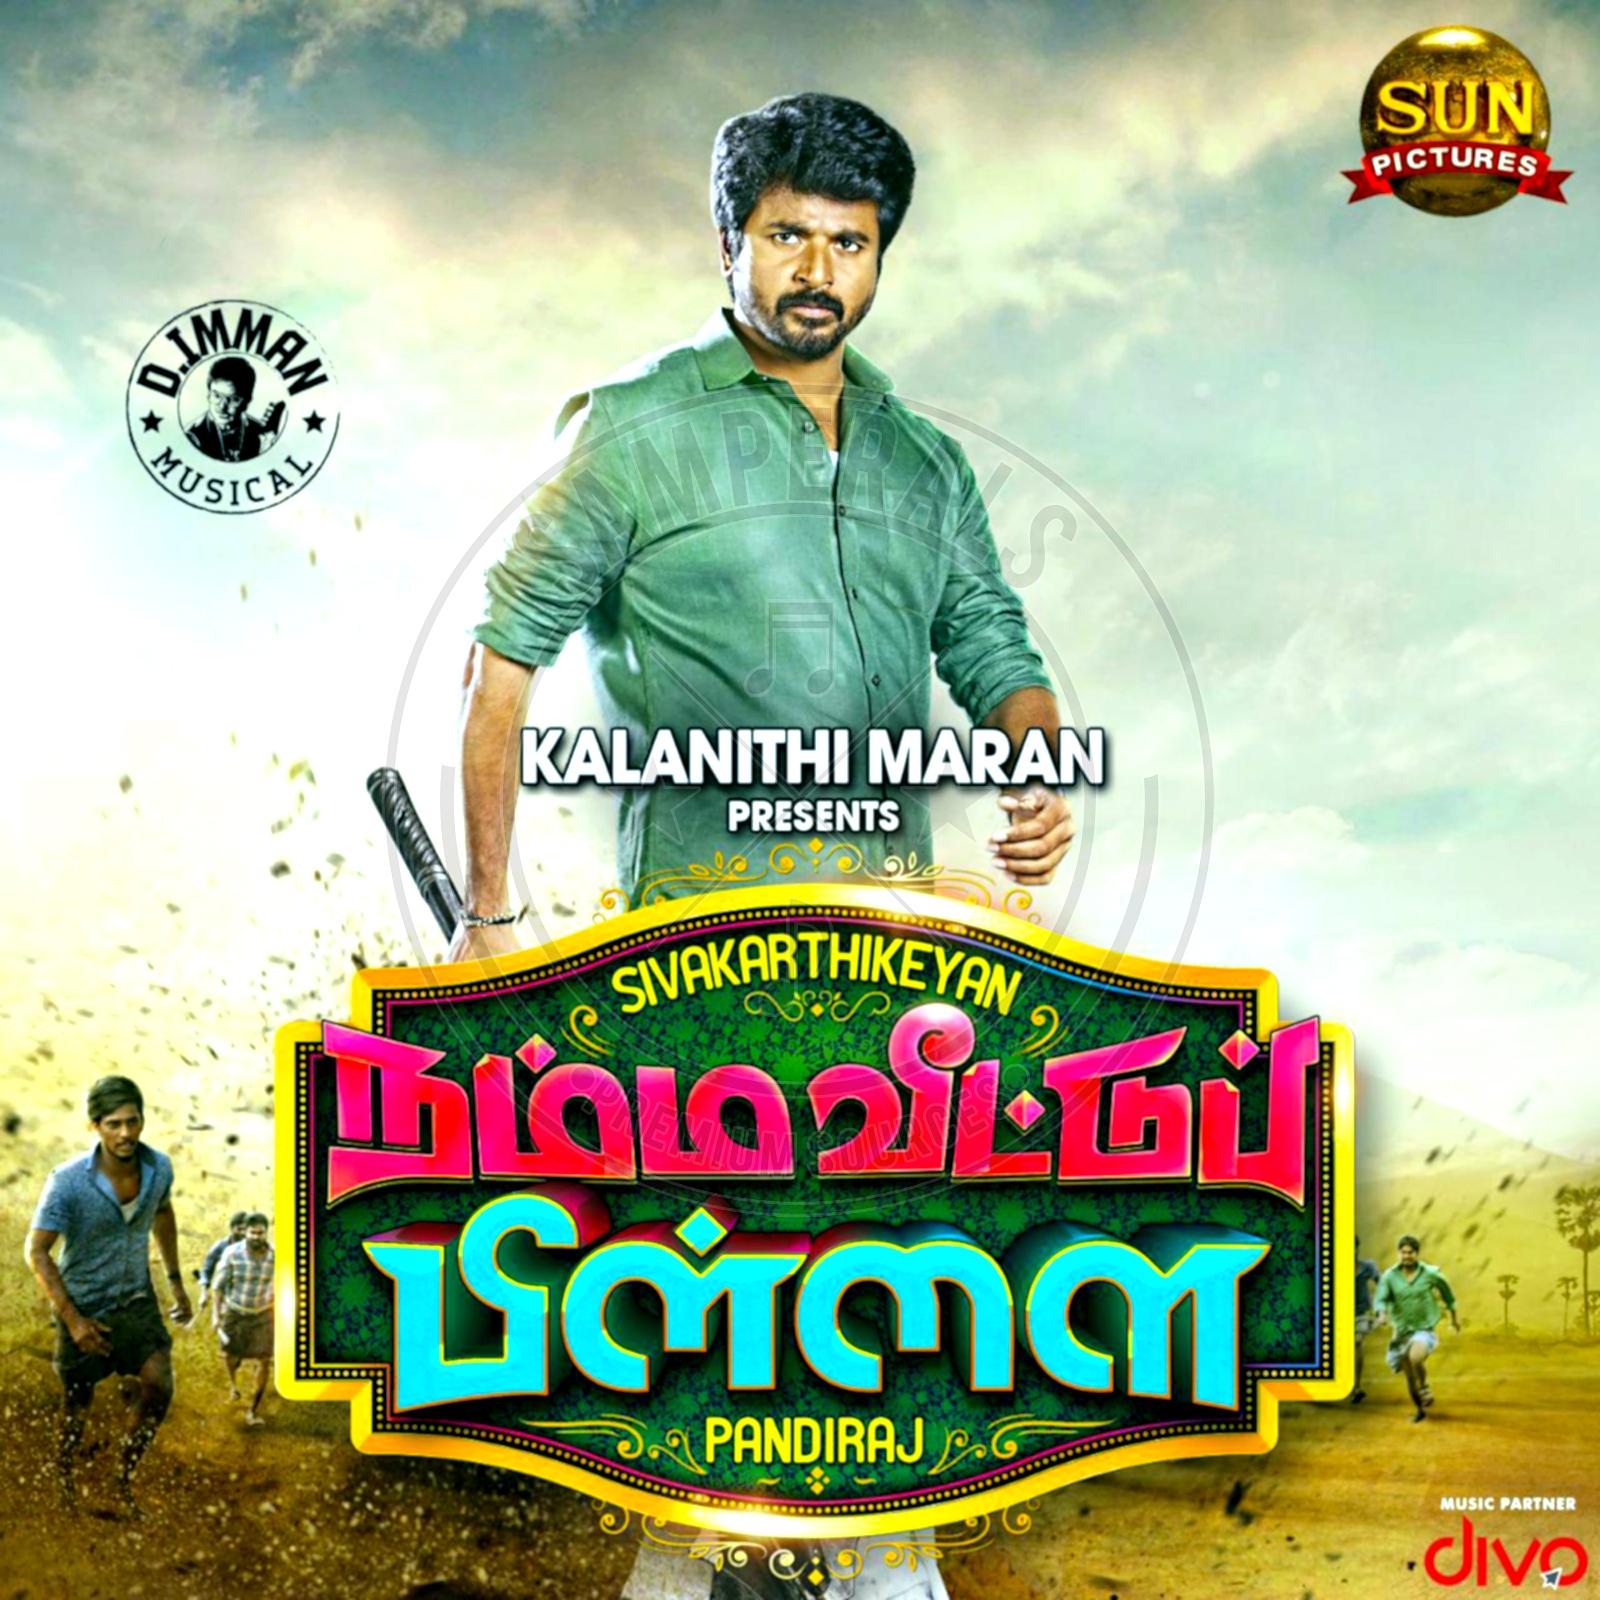 Namma Veettu Mappillai [2019-DIGITALRip-WAV] | Mp3 song download, Old song  download, Audio songs free download